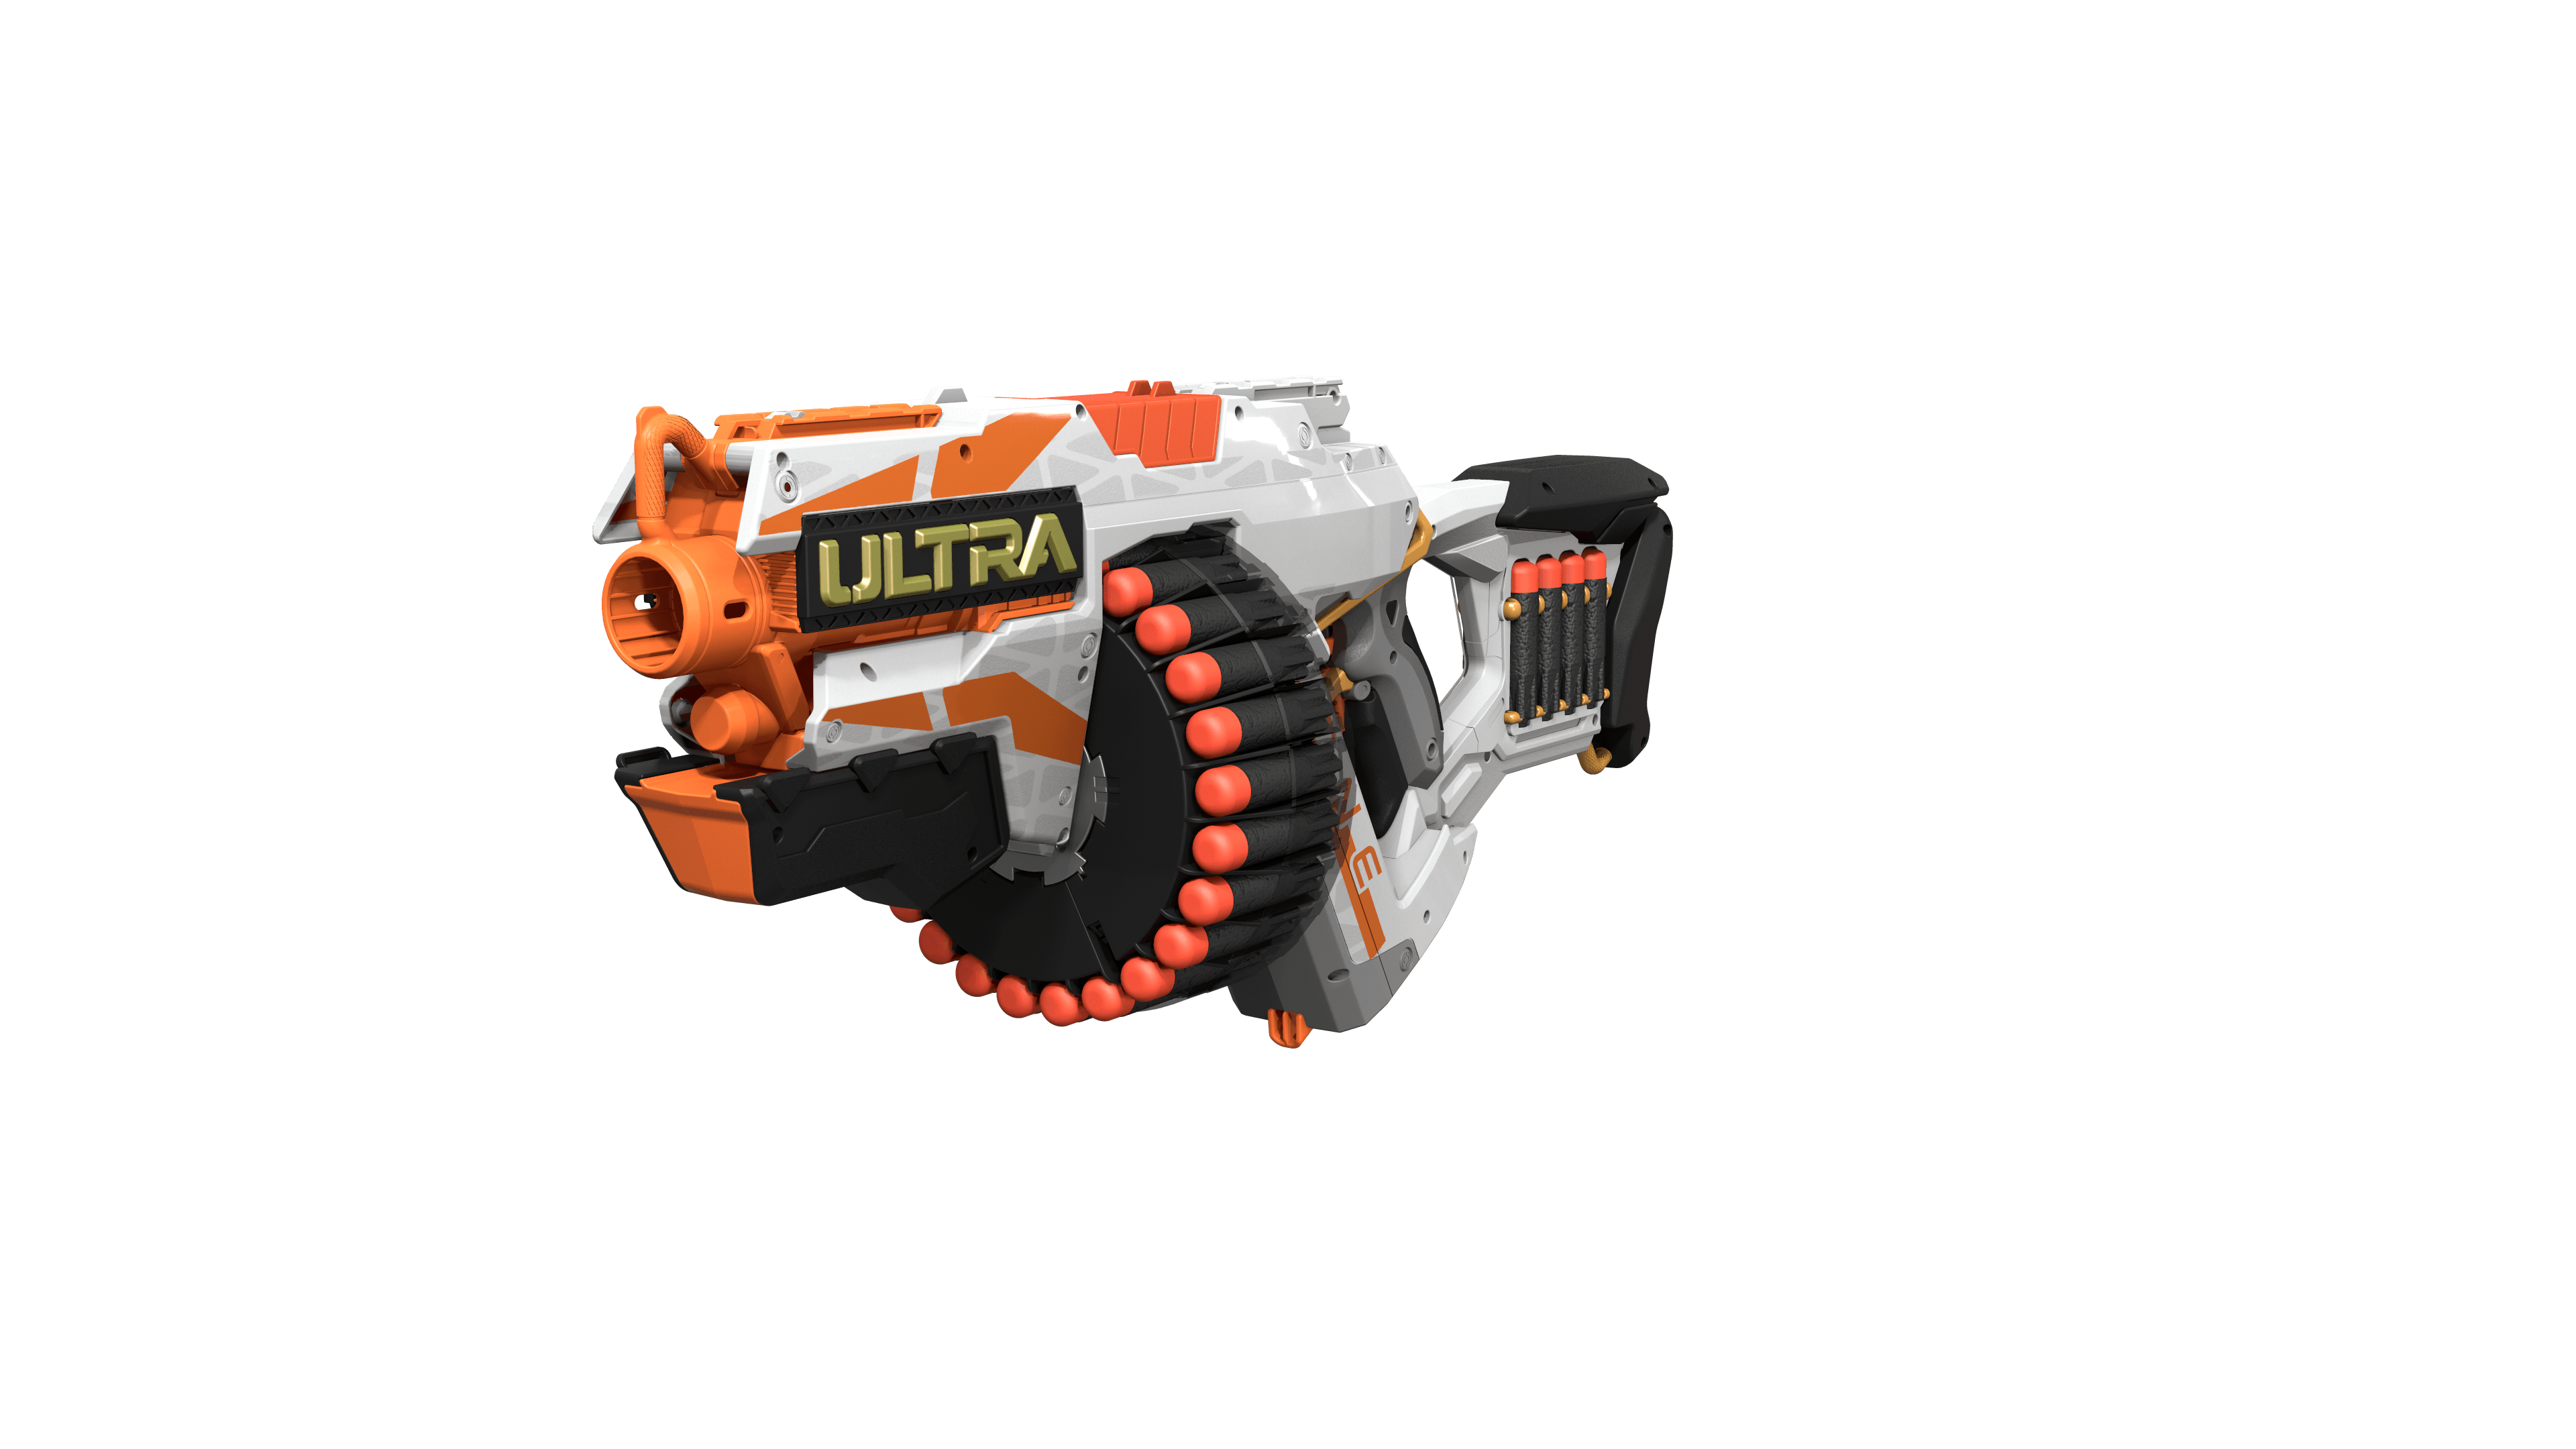 ultra blaster img 80